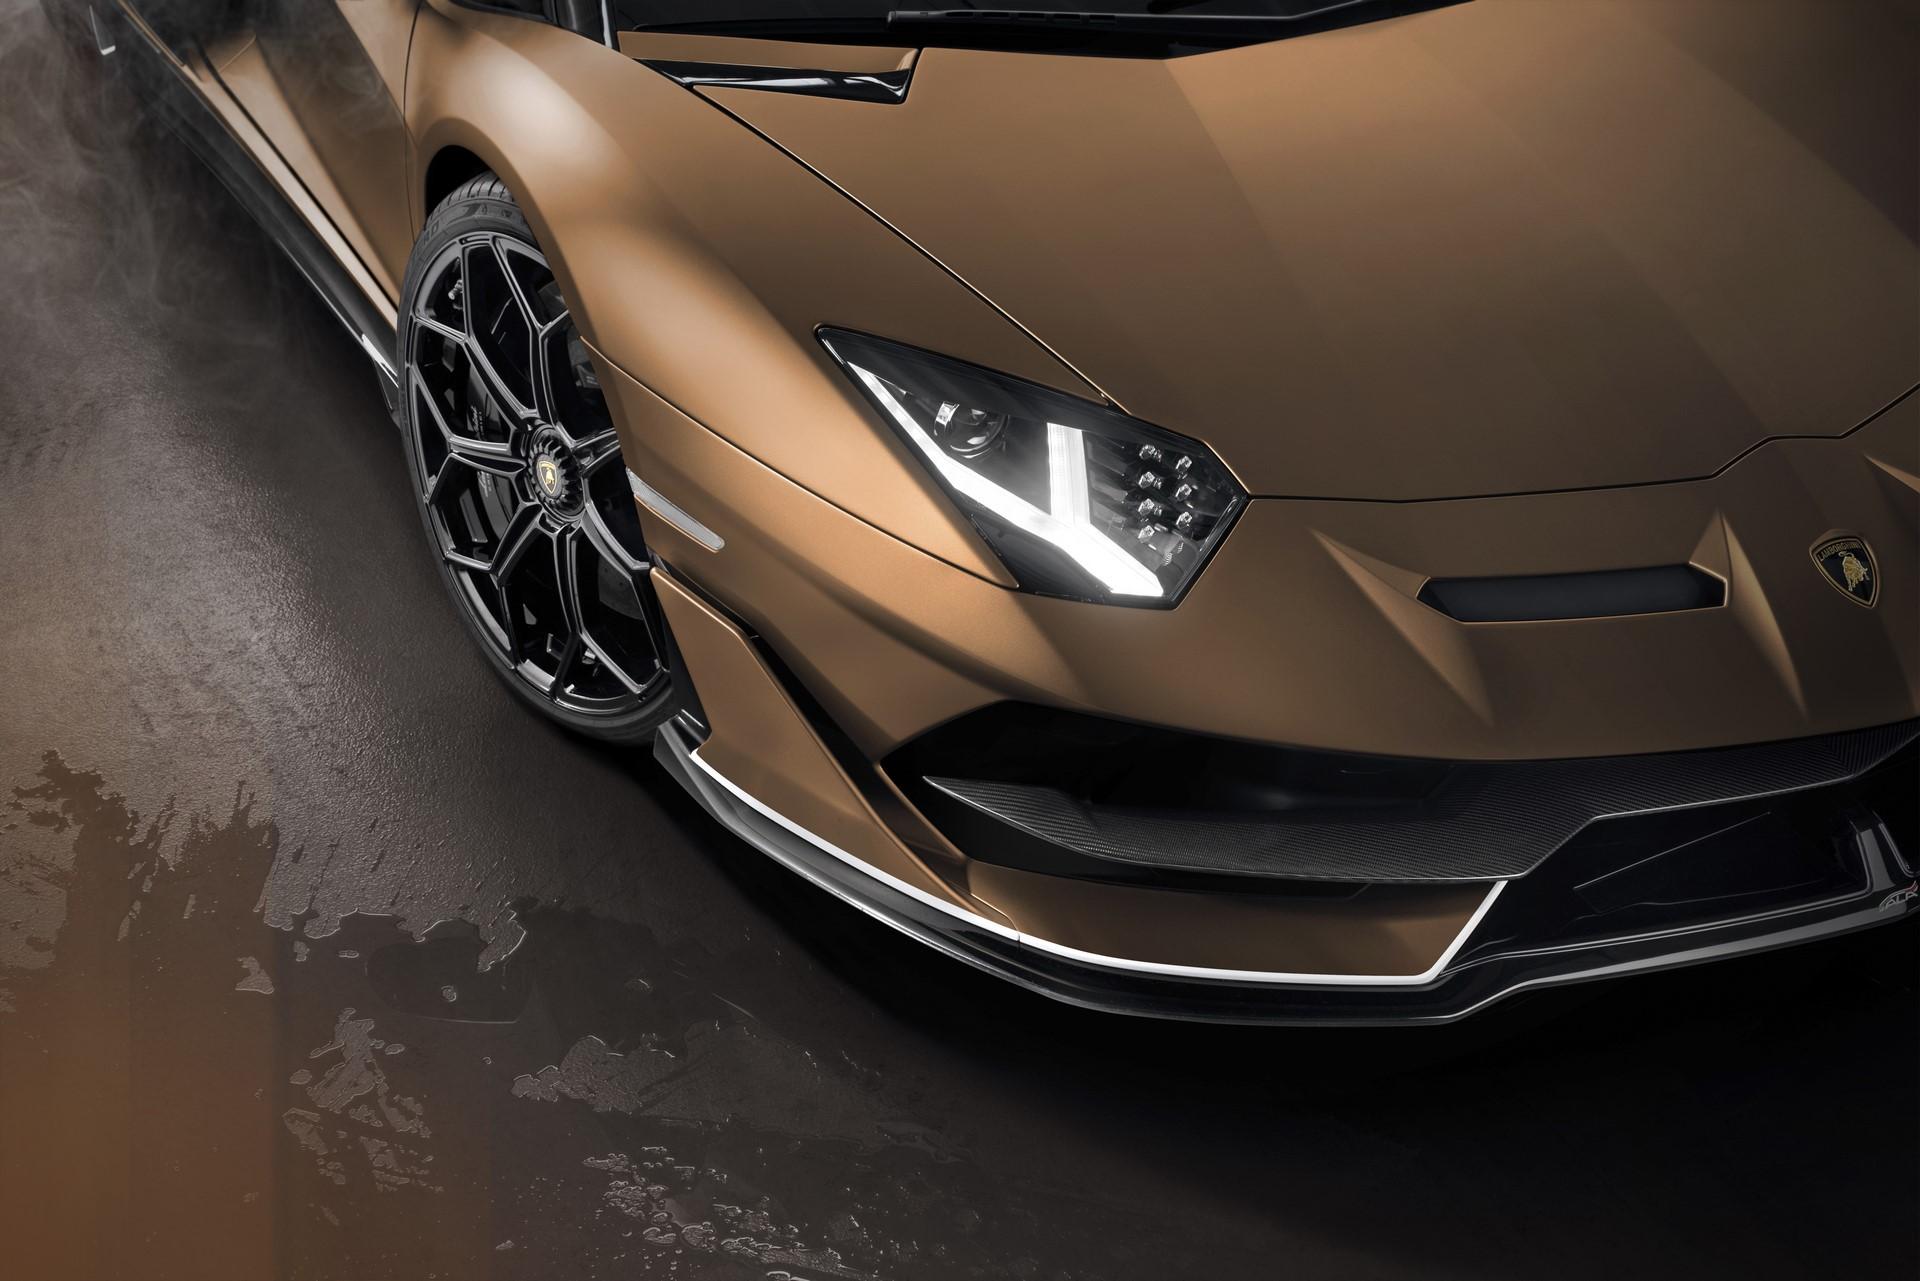 Lamborghini Aventador SVJ Roadster (3)